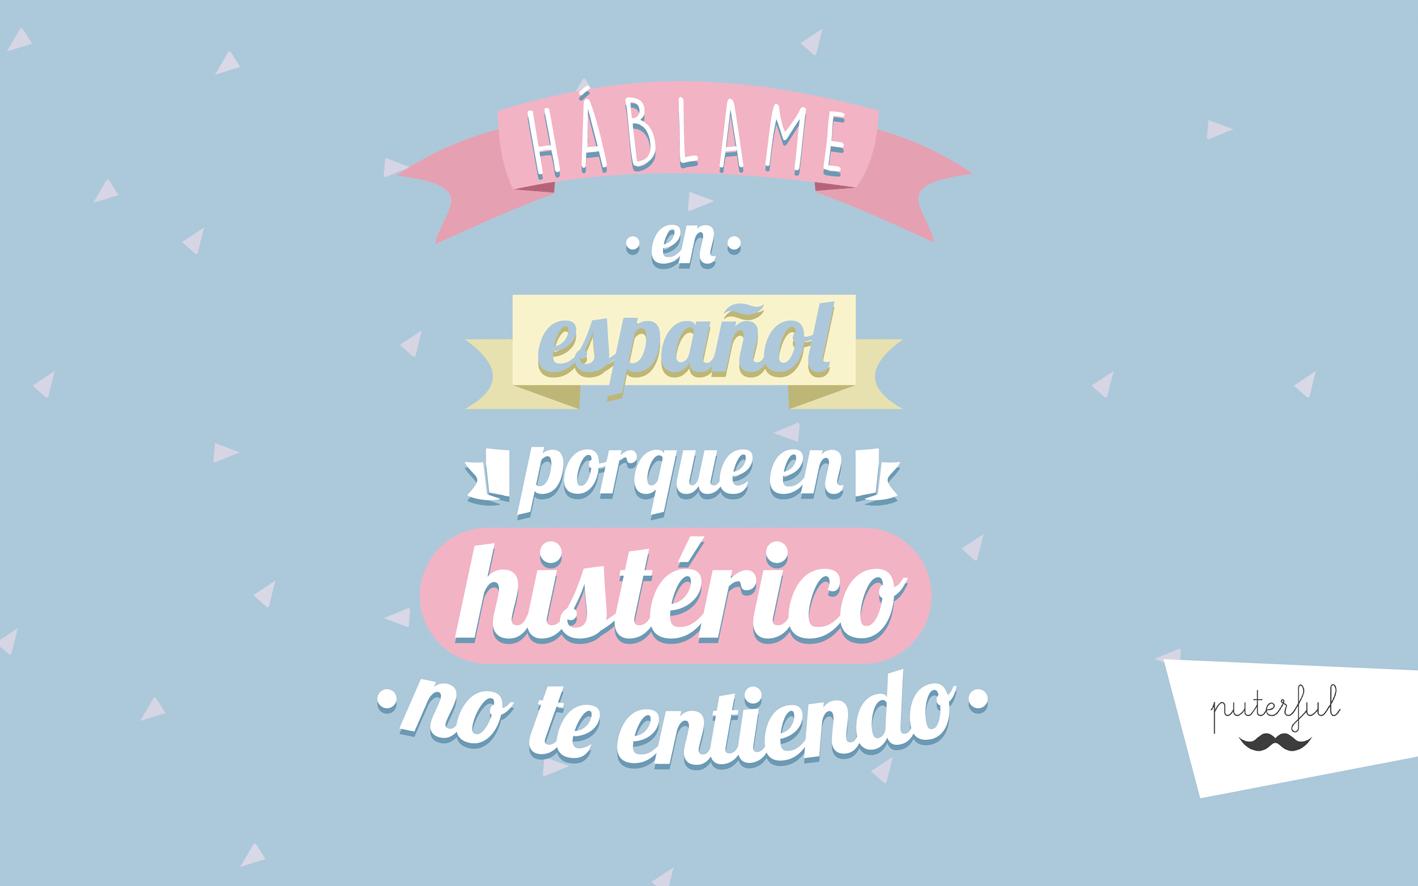 Diseño háblame en español Puterful